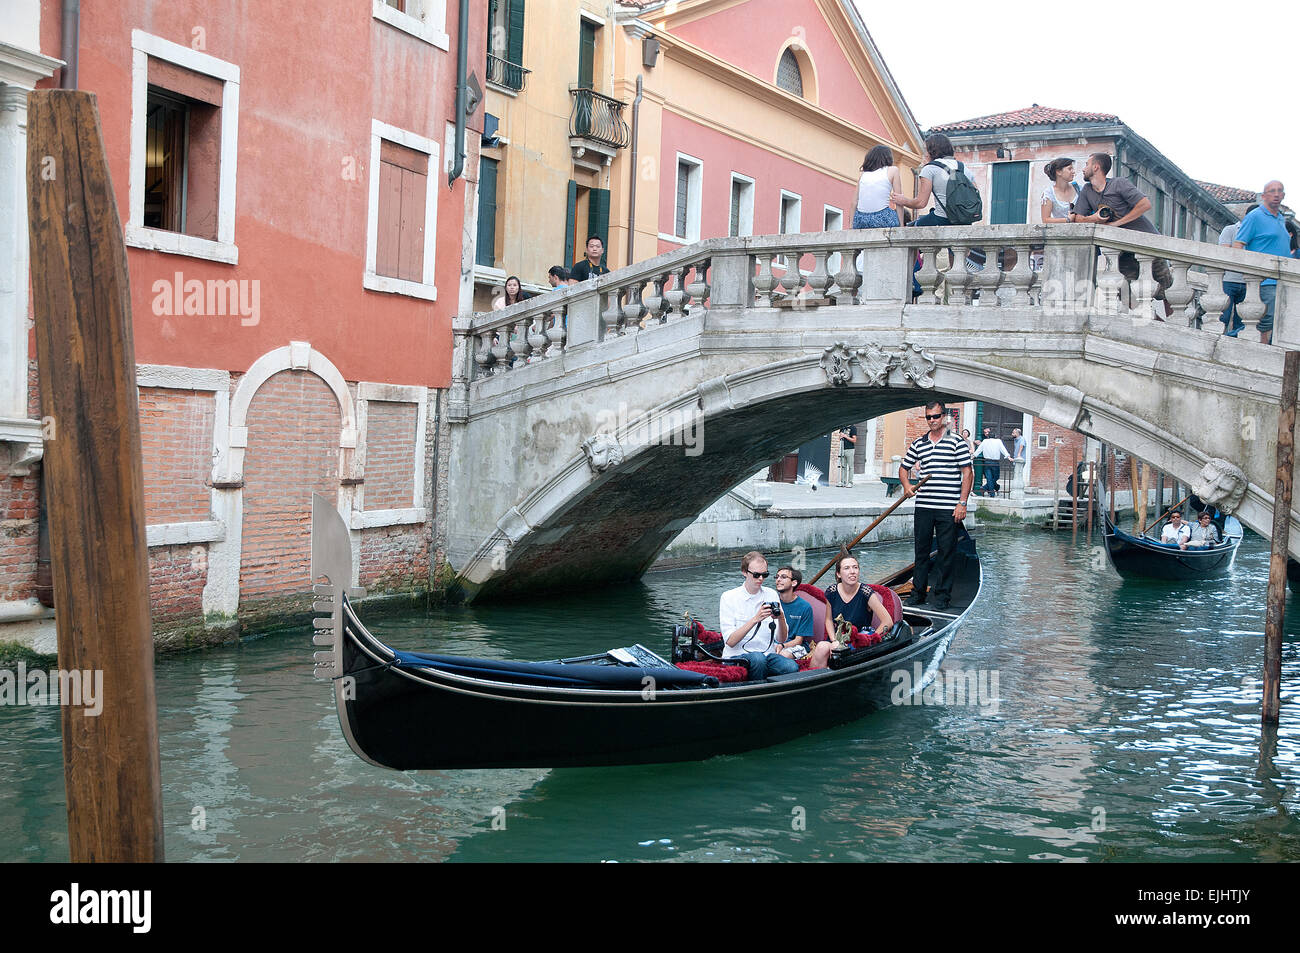 People enjoying ride on gondola on Rio de Palazzo de Canonica Venice Italy near Bridge of Sighs - Stock Image